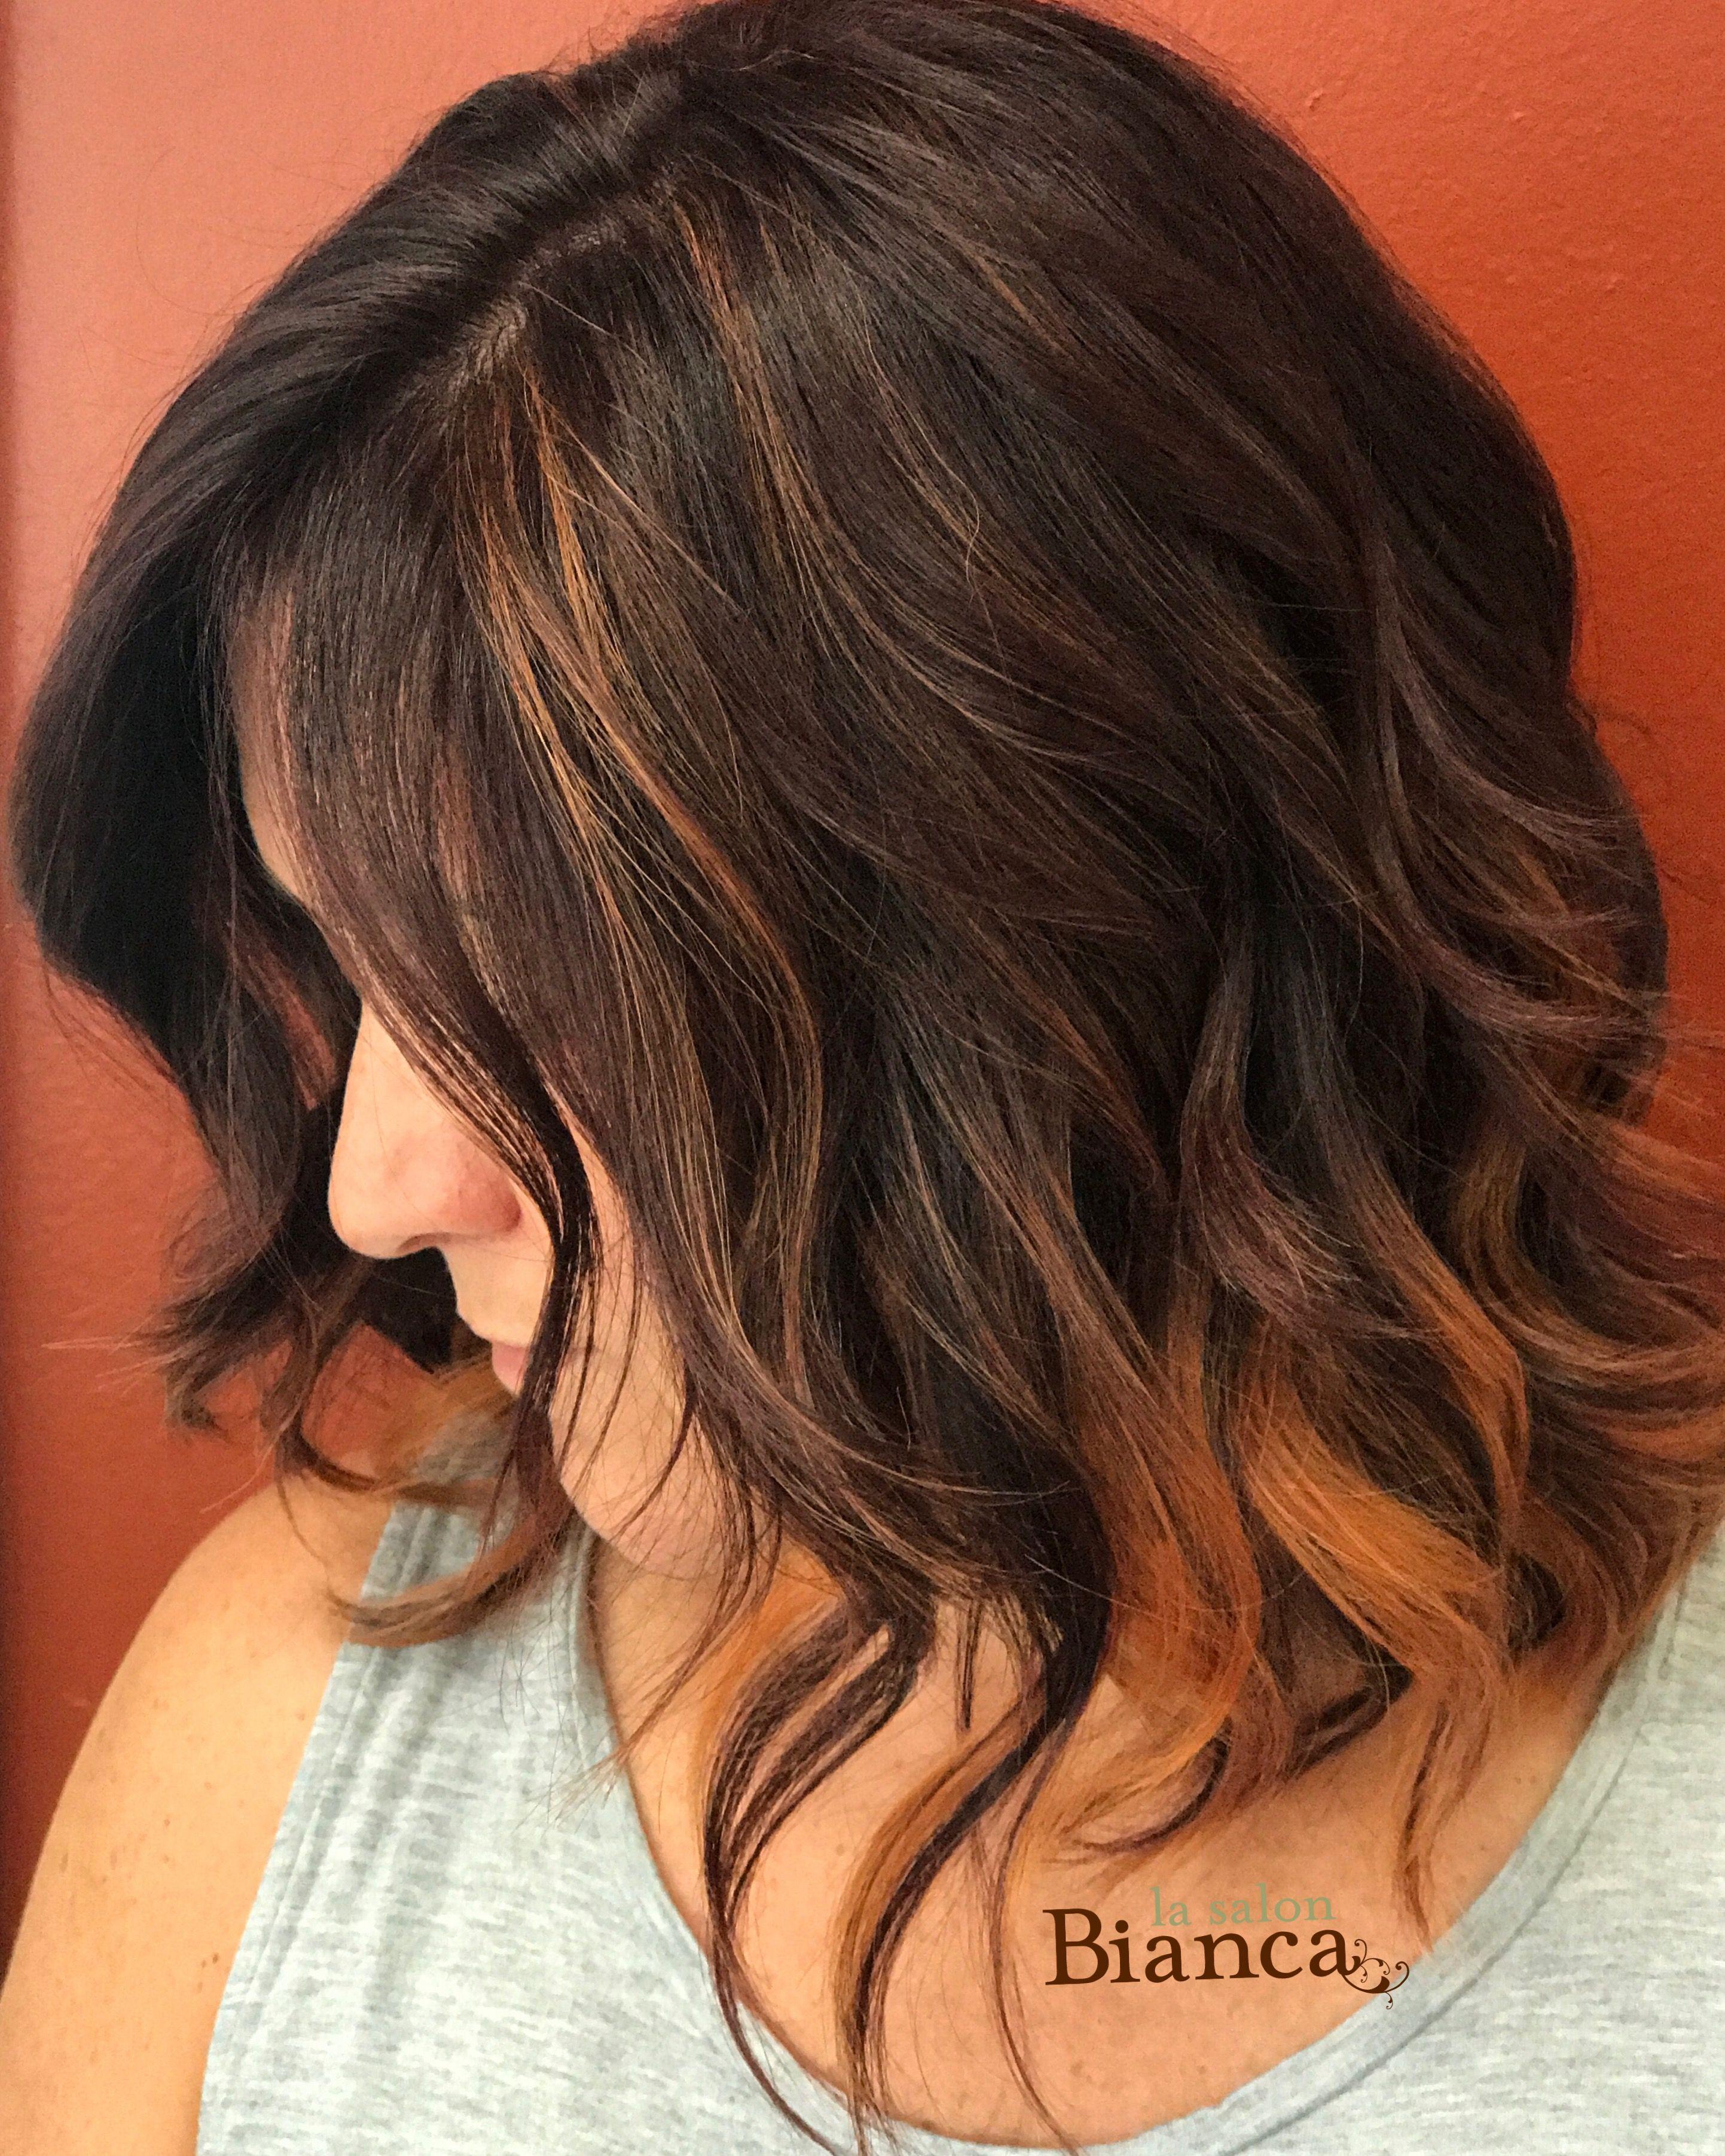 Pin On Hair By Kristina At La Salon Bianca